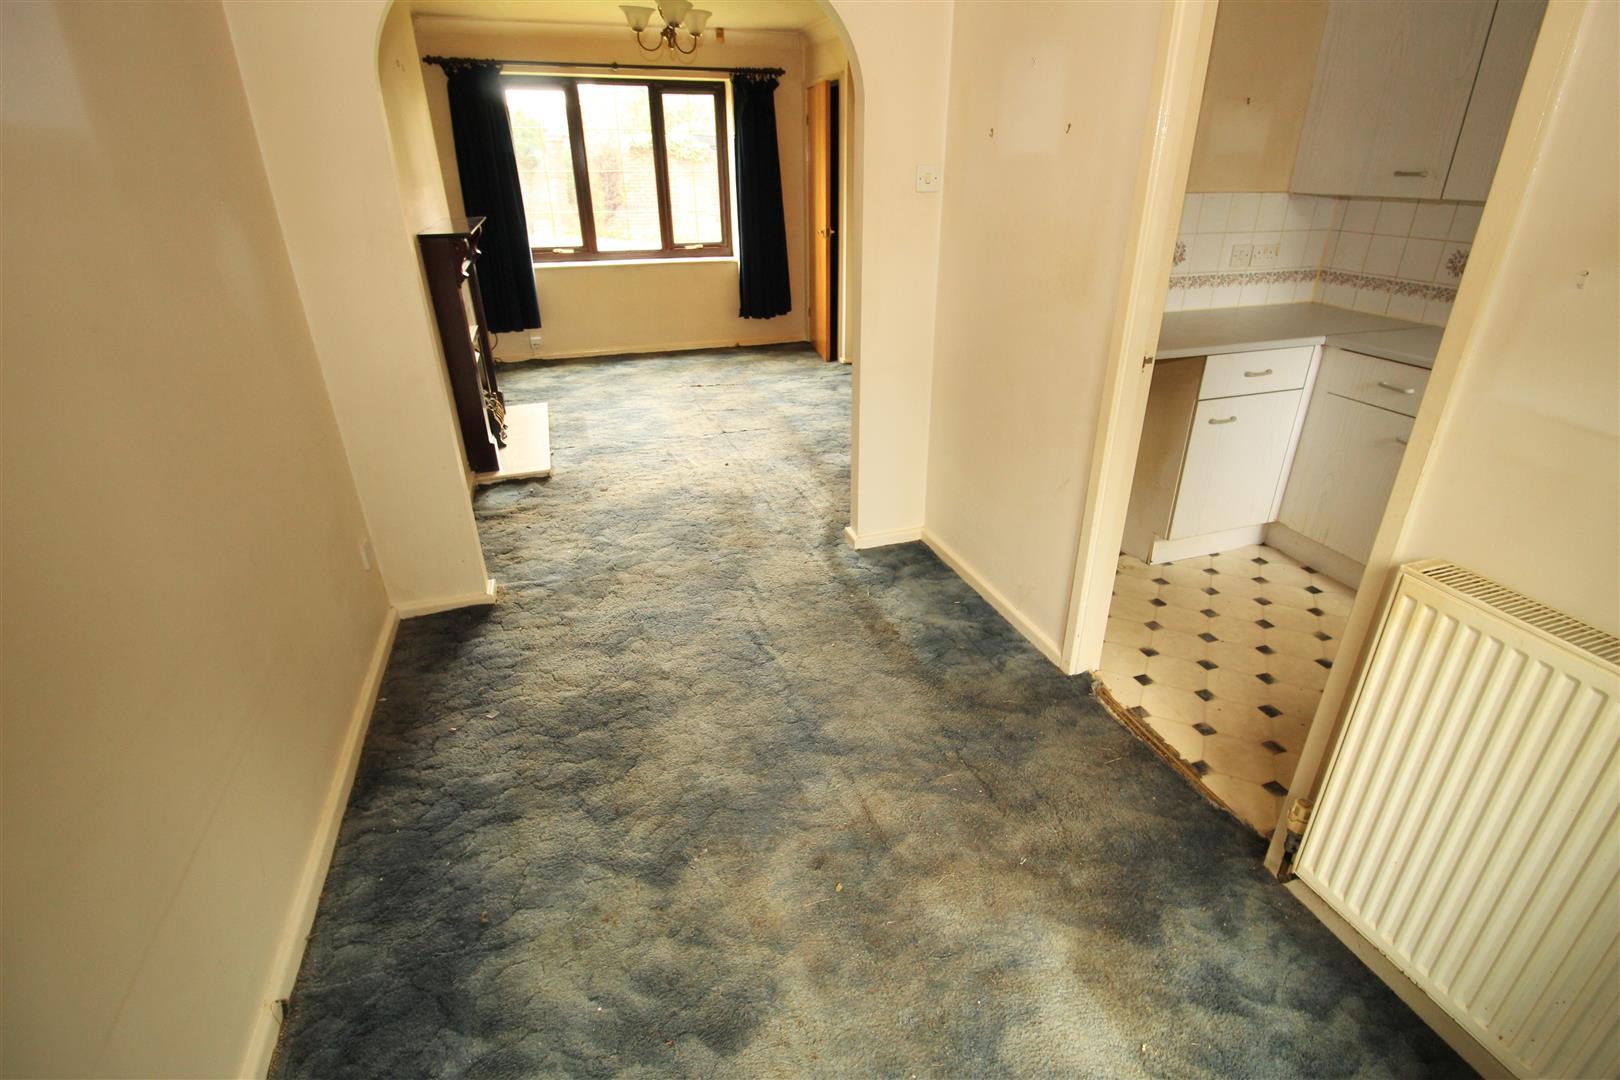 2 Bedrooms, House - Semi-Detached, Carnforth Avenue, Liverpool